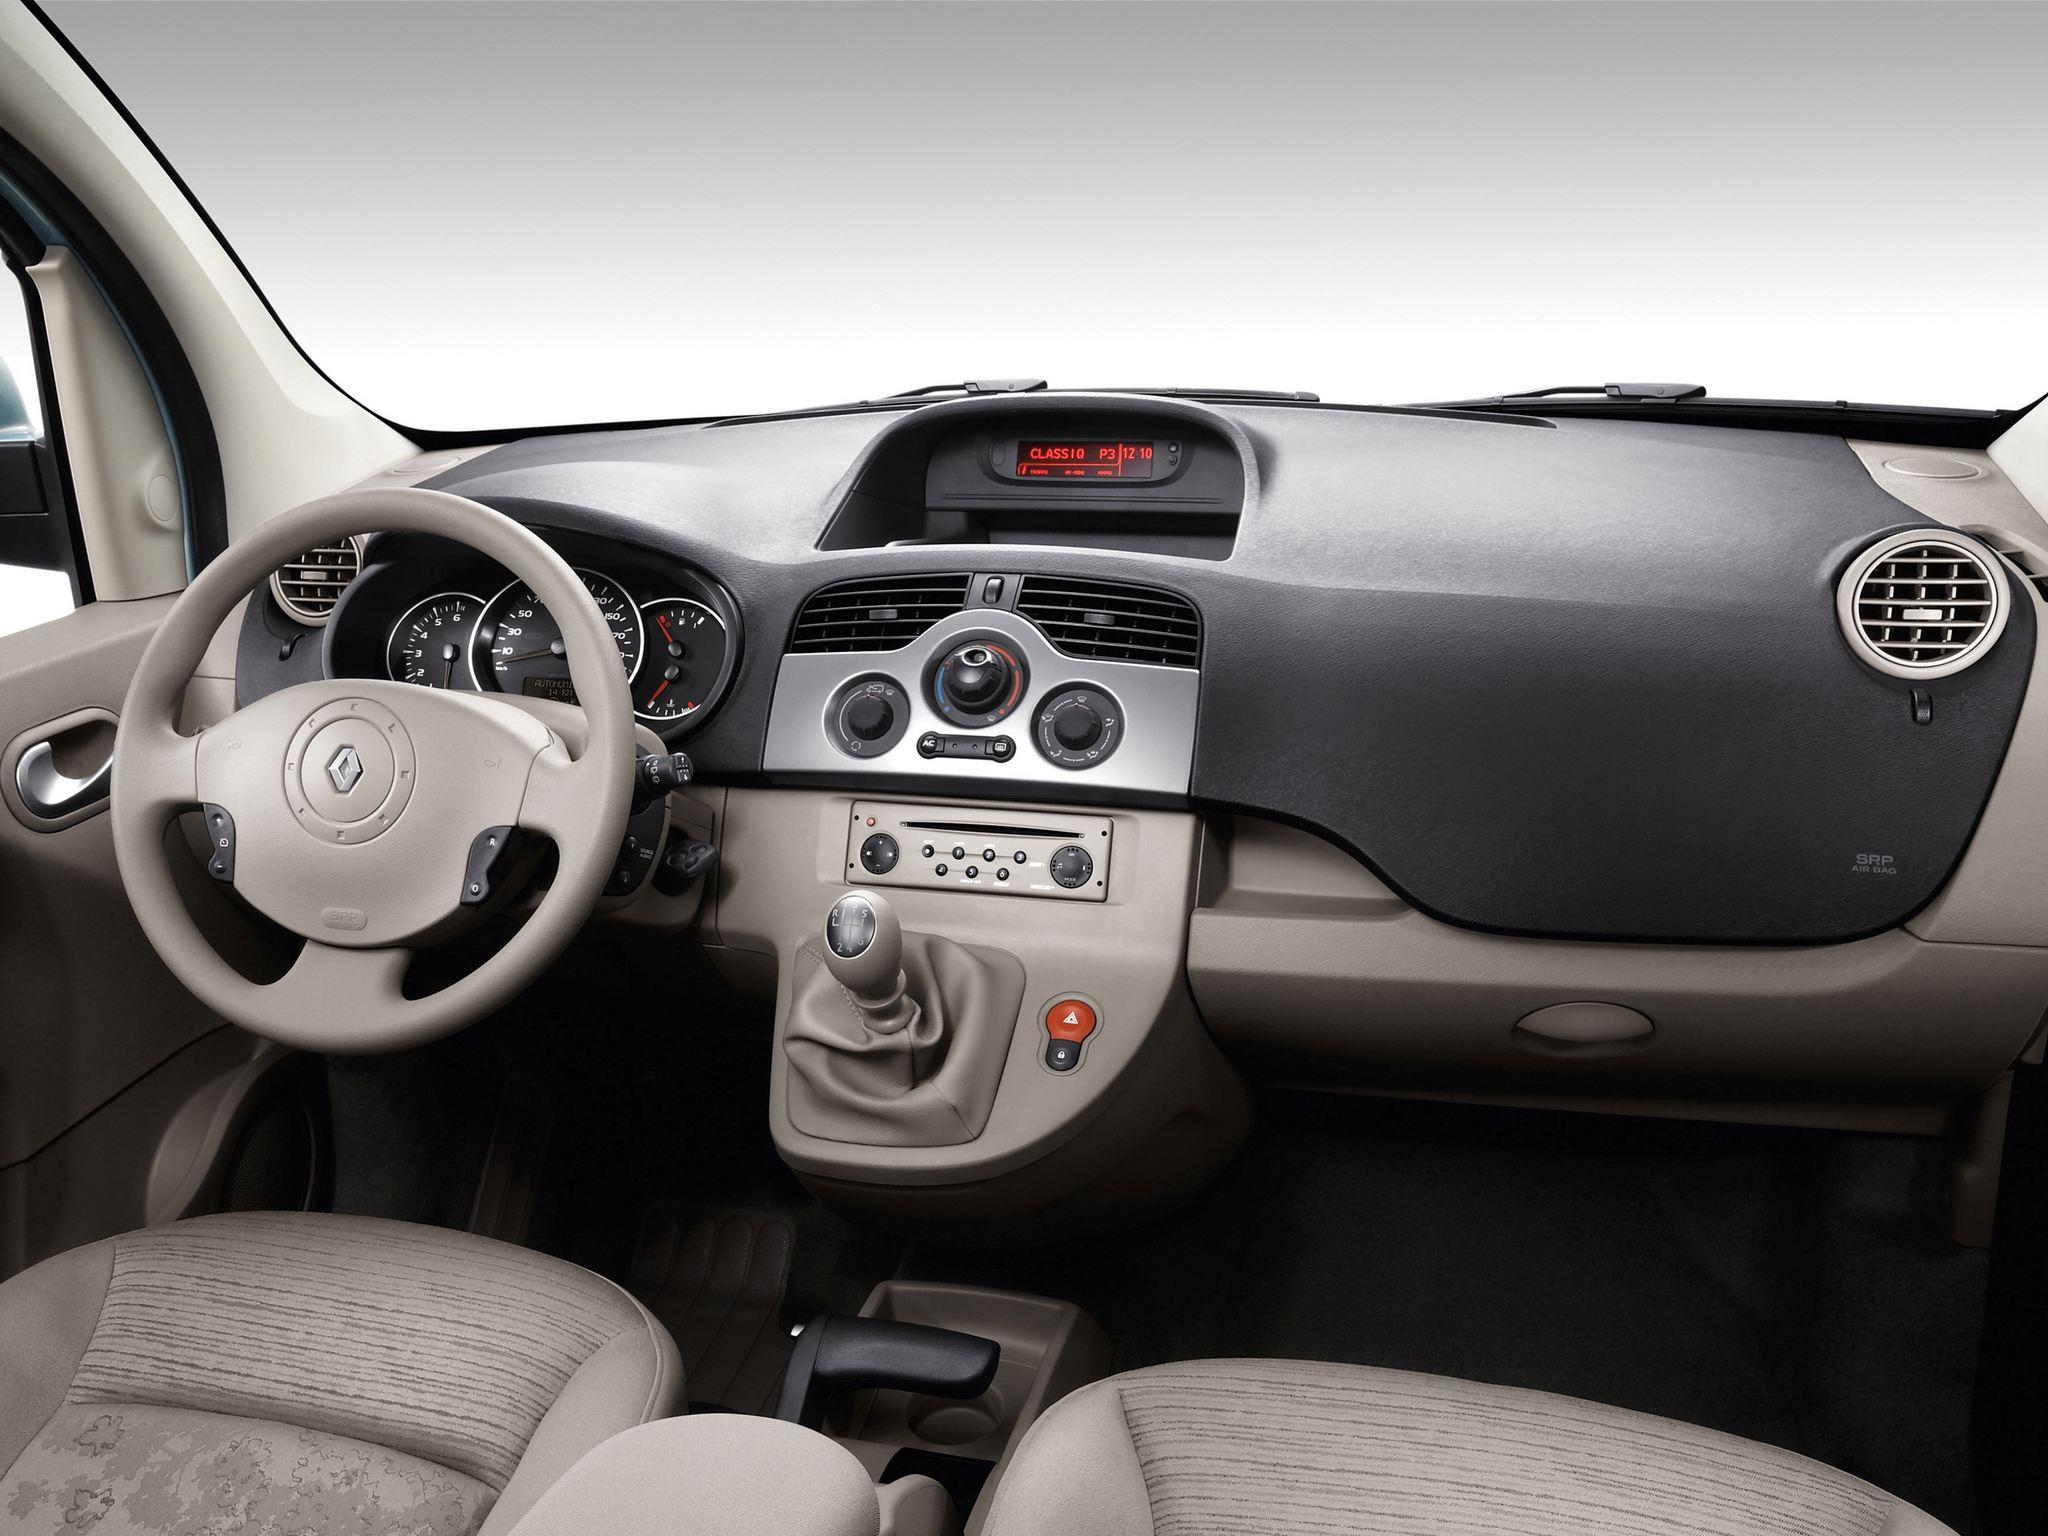 Renault Kangoo 1.5 dCi 84hp MT